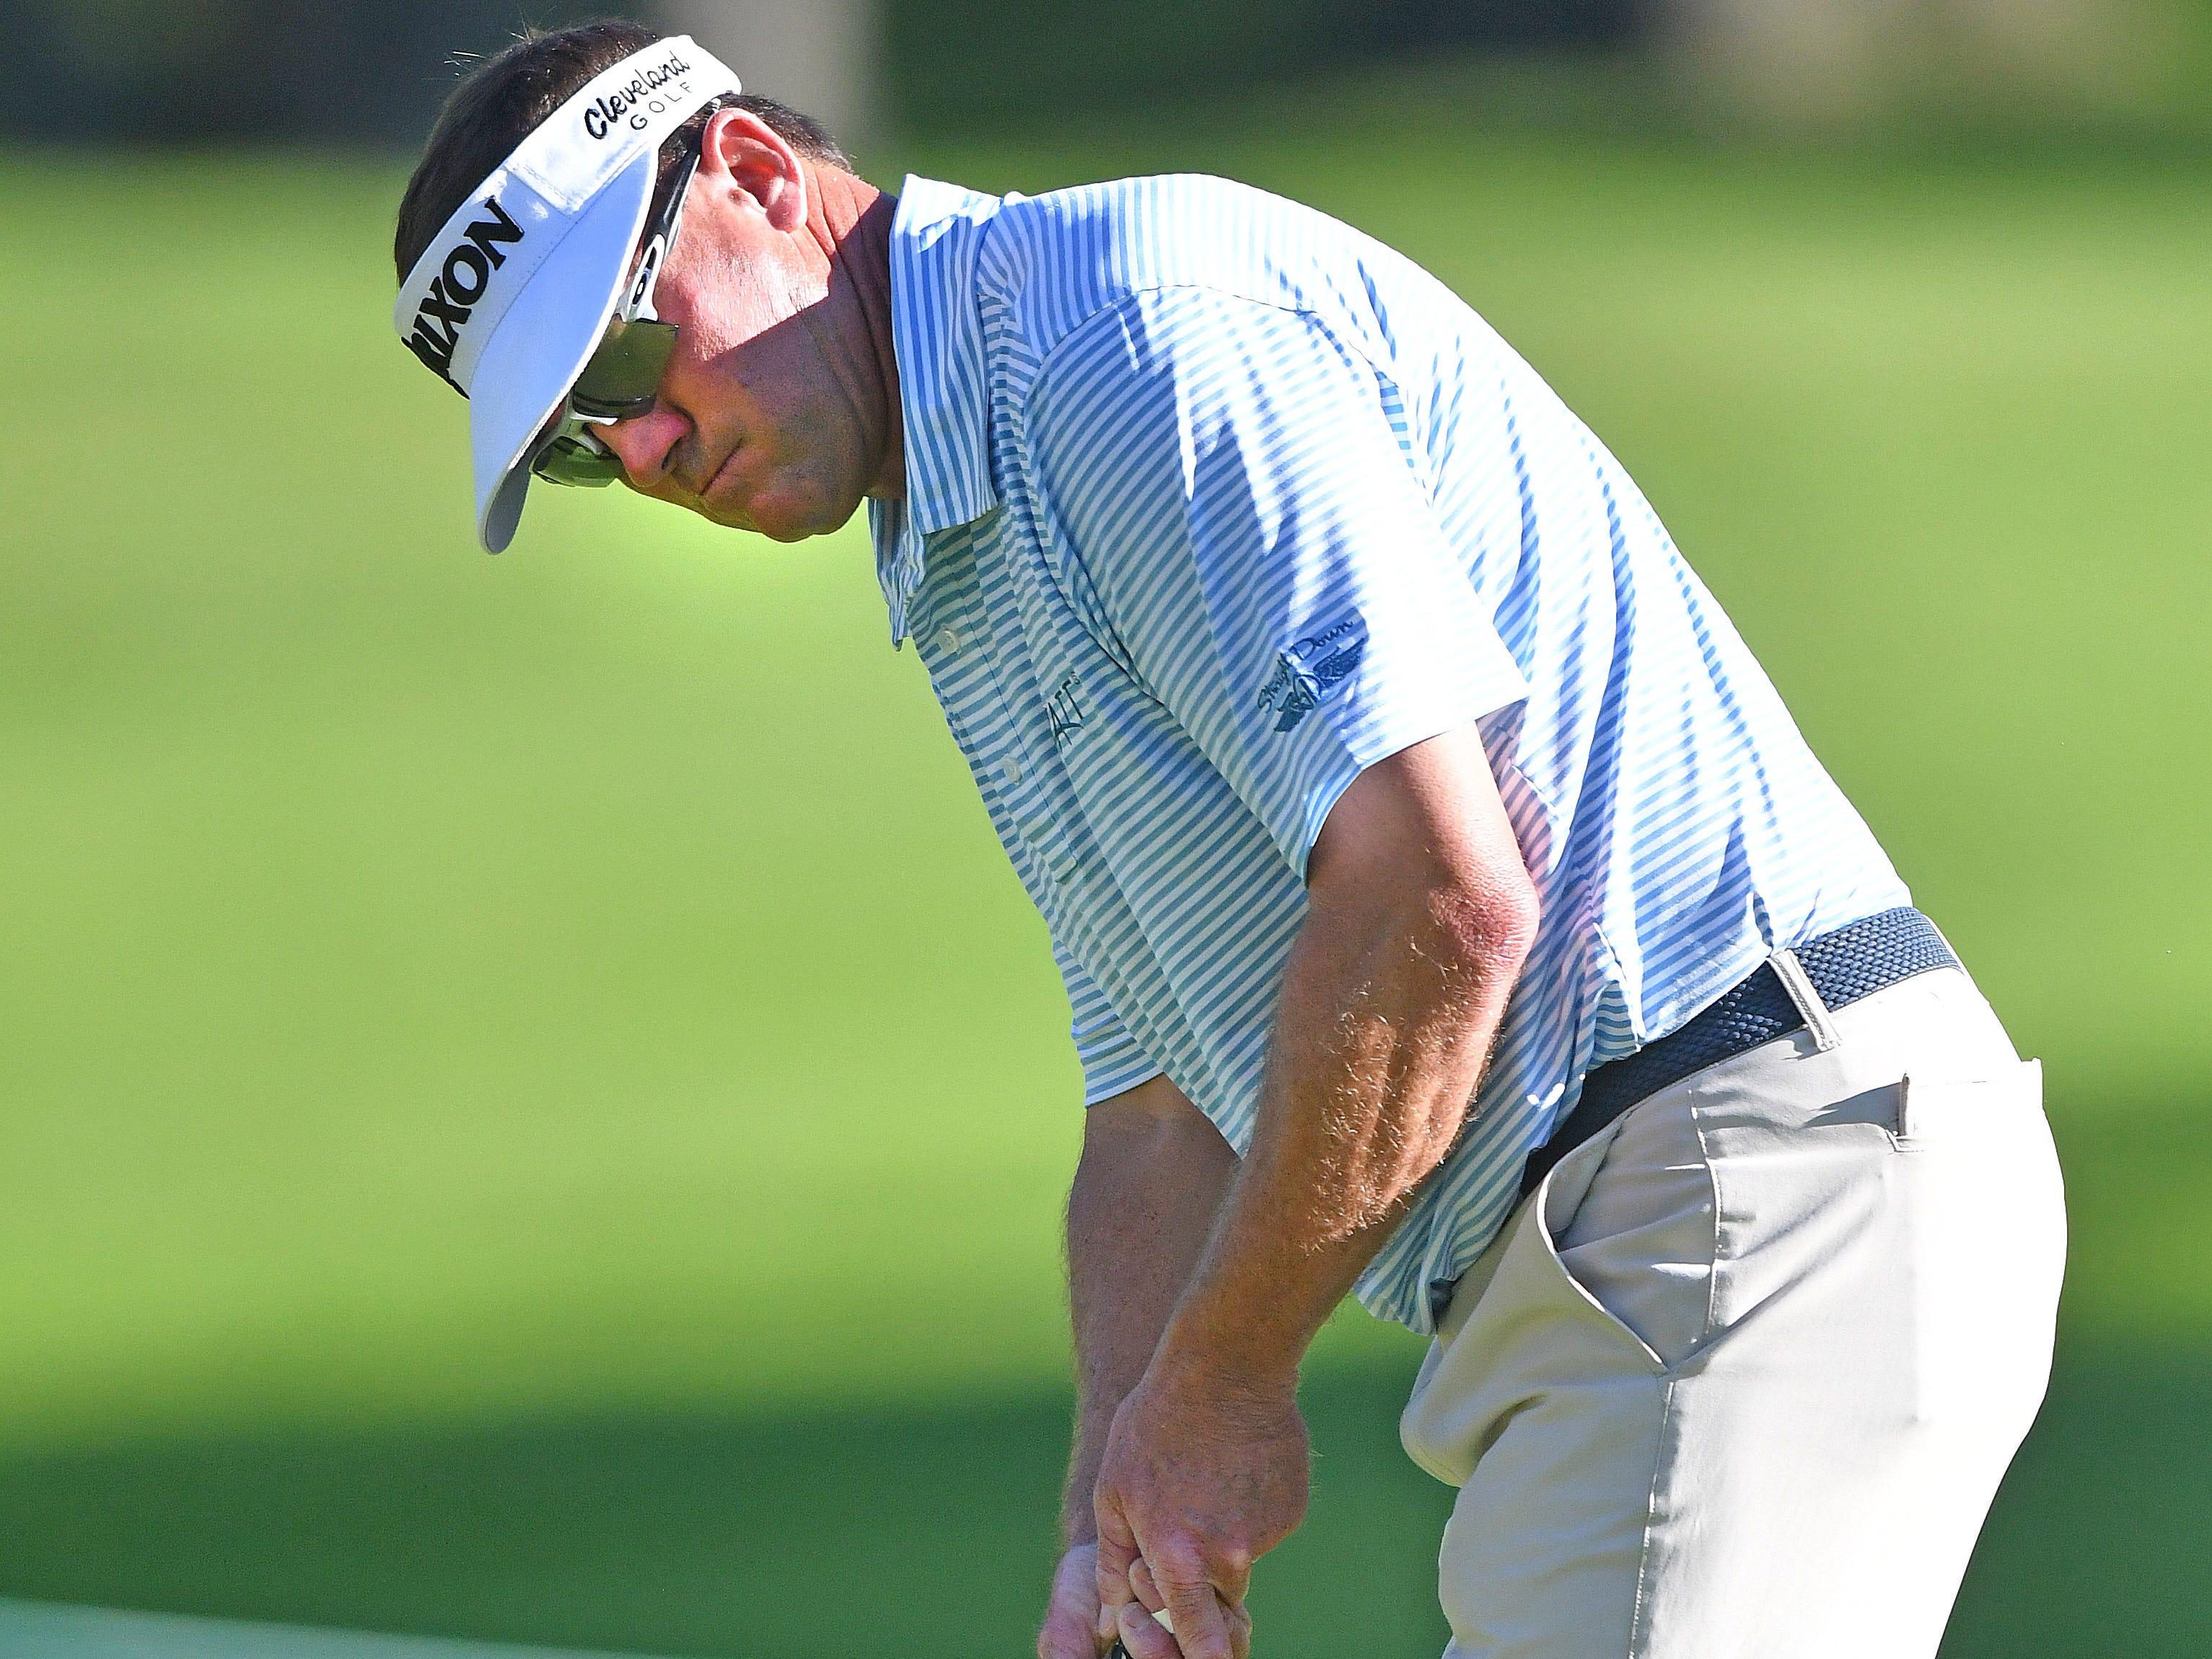 Brandt Jobe misses his birdie putt on the 17th hole.